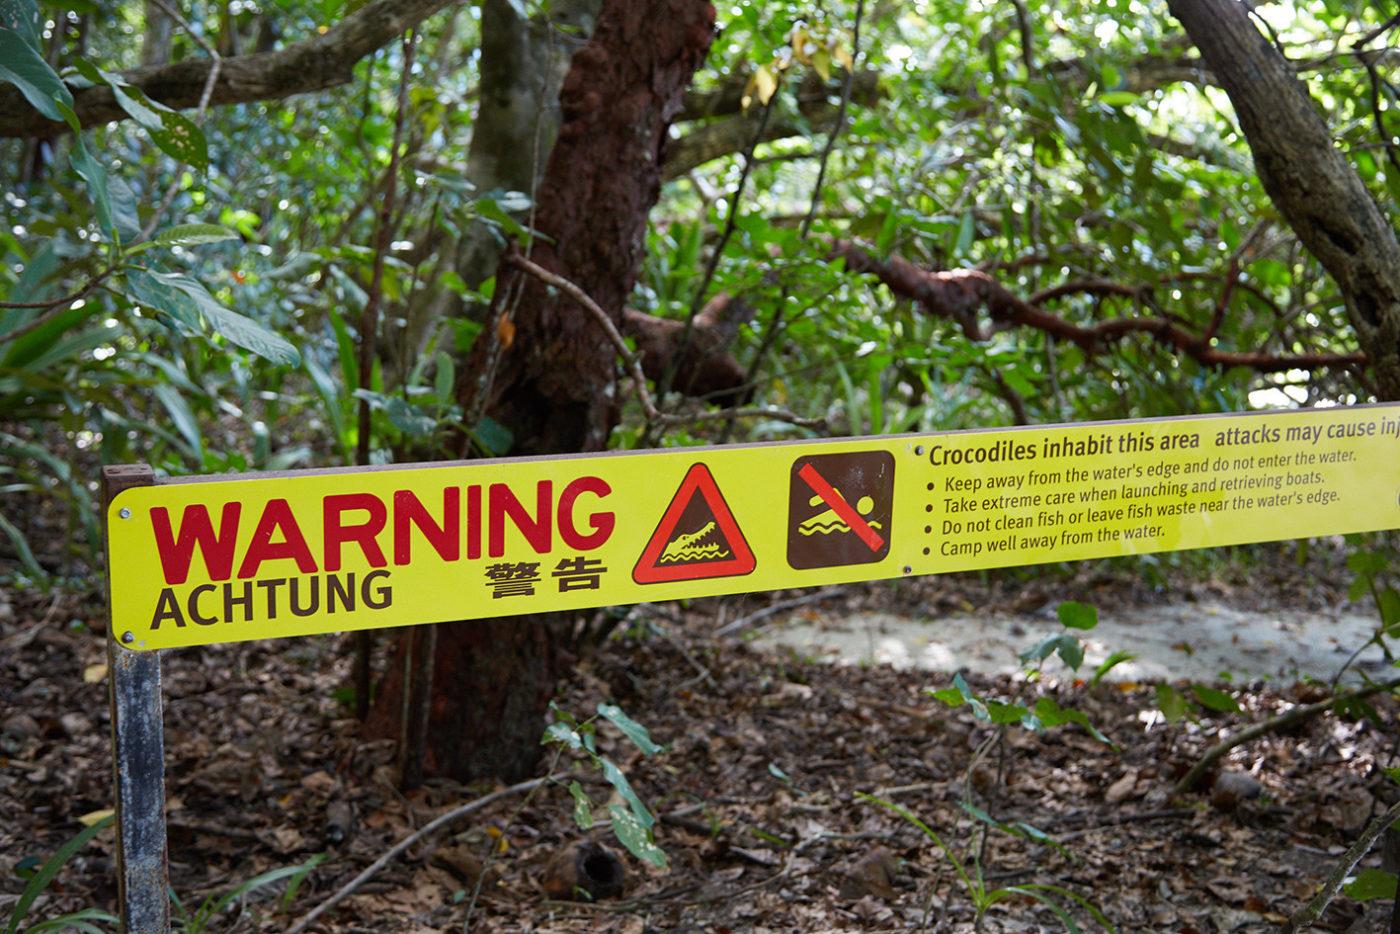 daintree, reiseblog, roadtrip, australien, milesandshores, cape tribulation, strand, beach, watch out for krokodiles, achtung krokodile